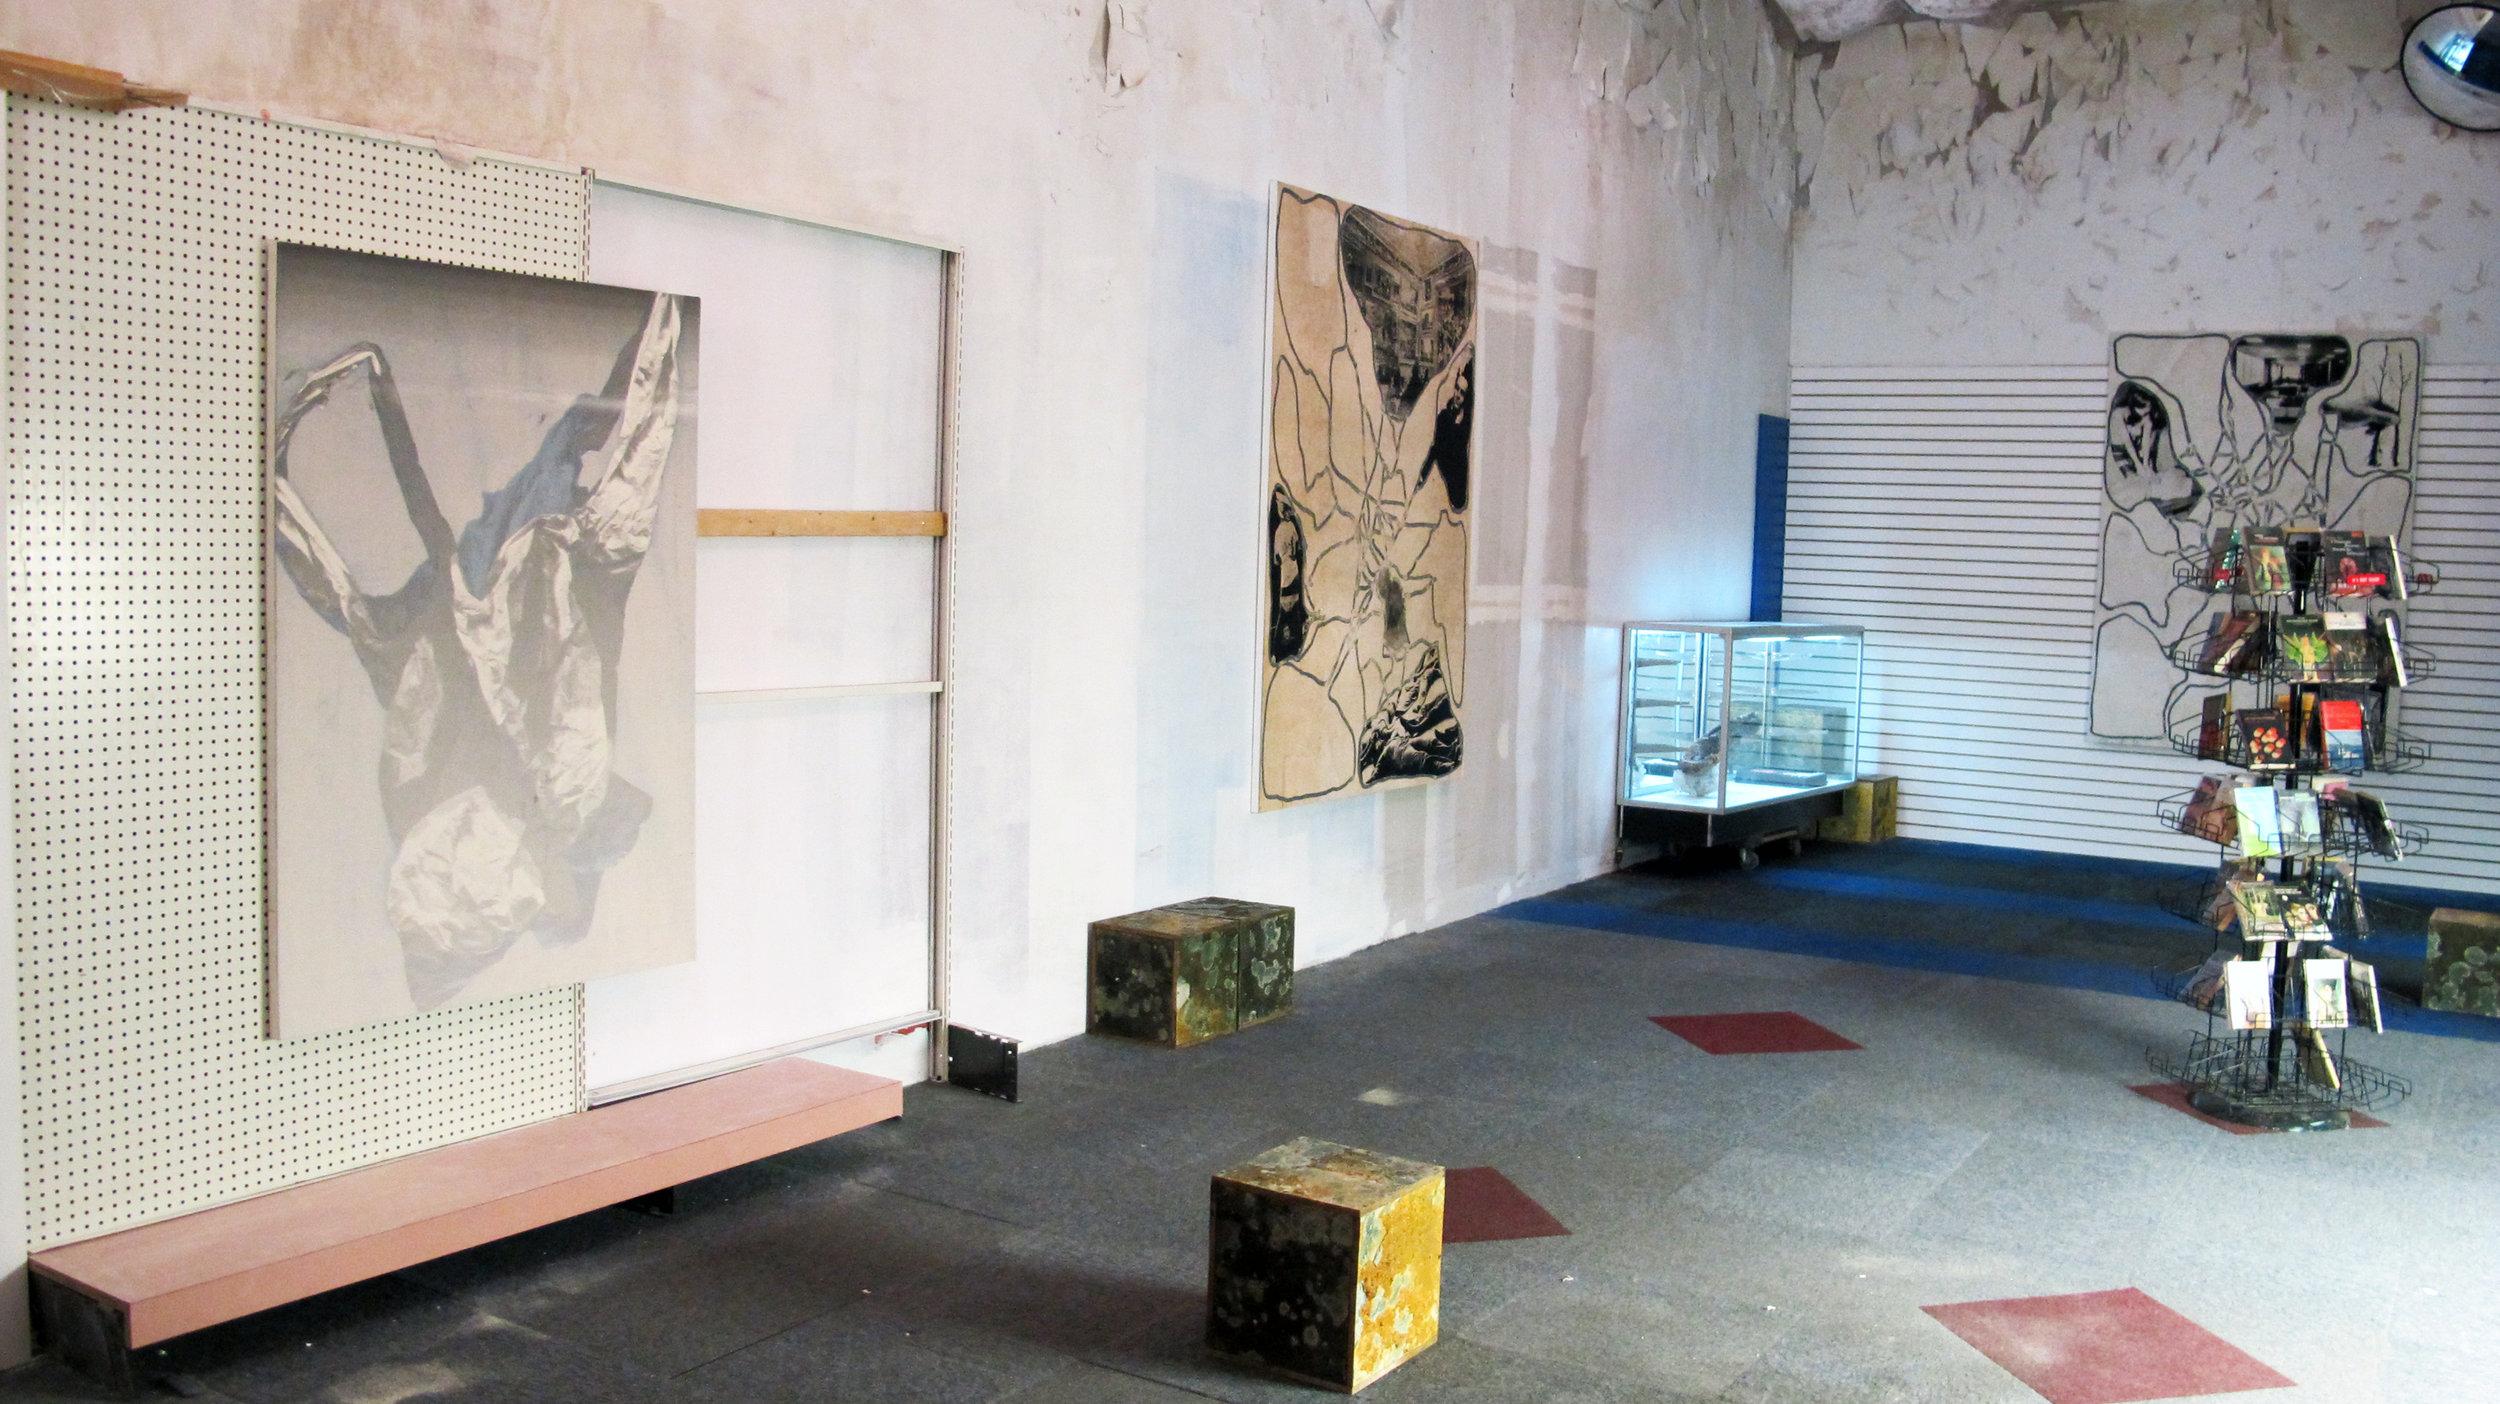 Freeman-Lowe, PANOPTICUM, Robert Miller Gallery, Installation View 27.JPG